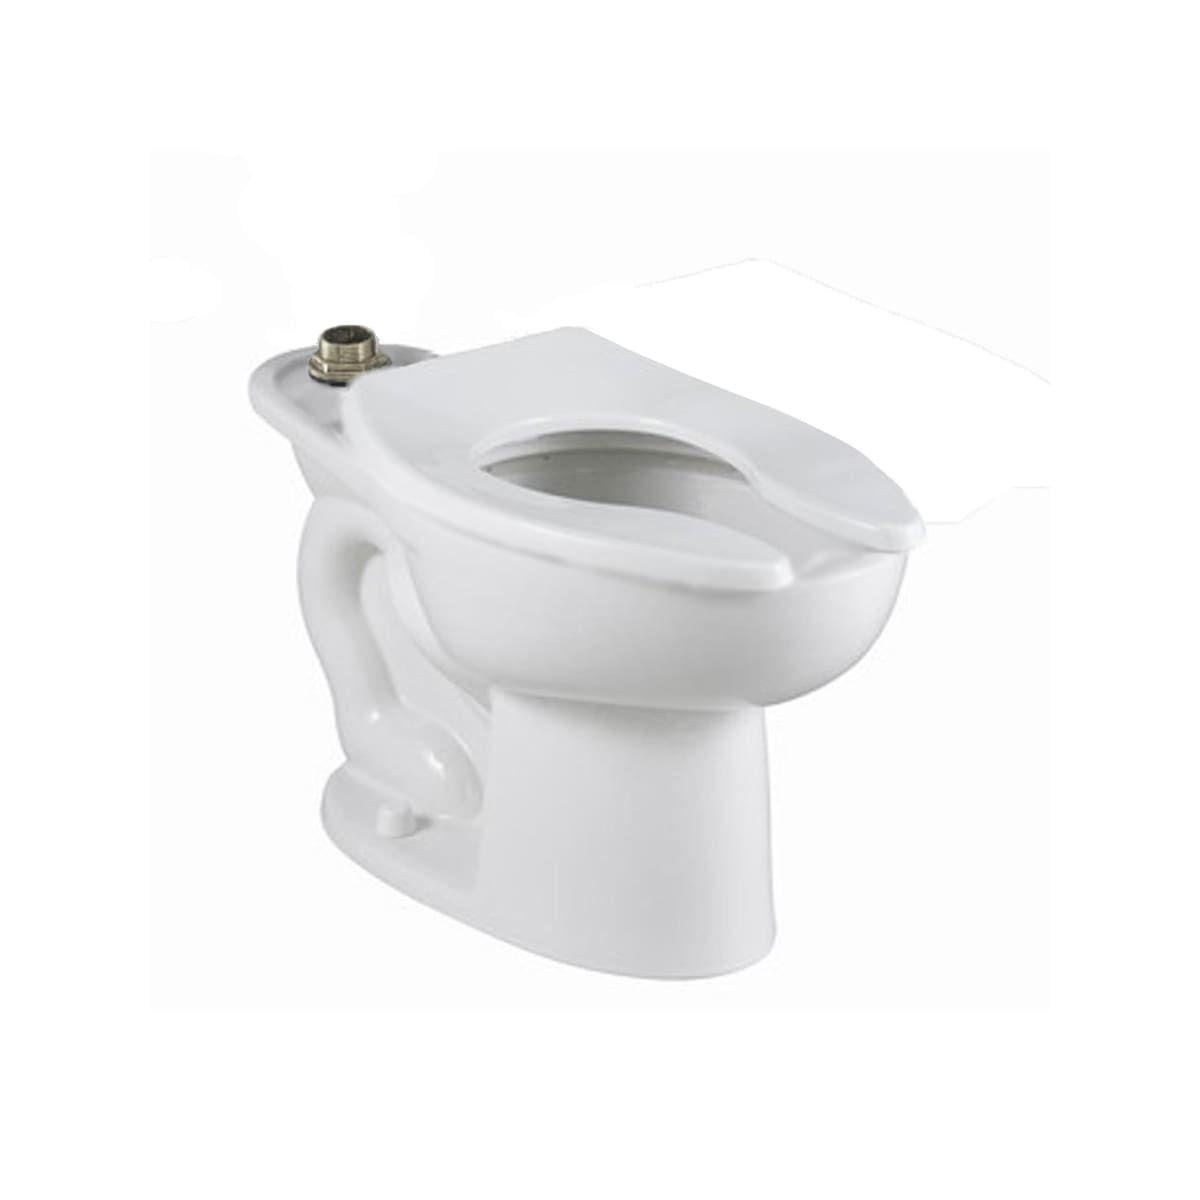 American Standard Toilet Bowl Floor Elongated 16 1 2 In H 3465001 02 White Products American Standard Toilet Toilet Bowl